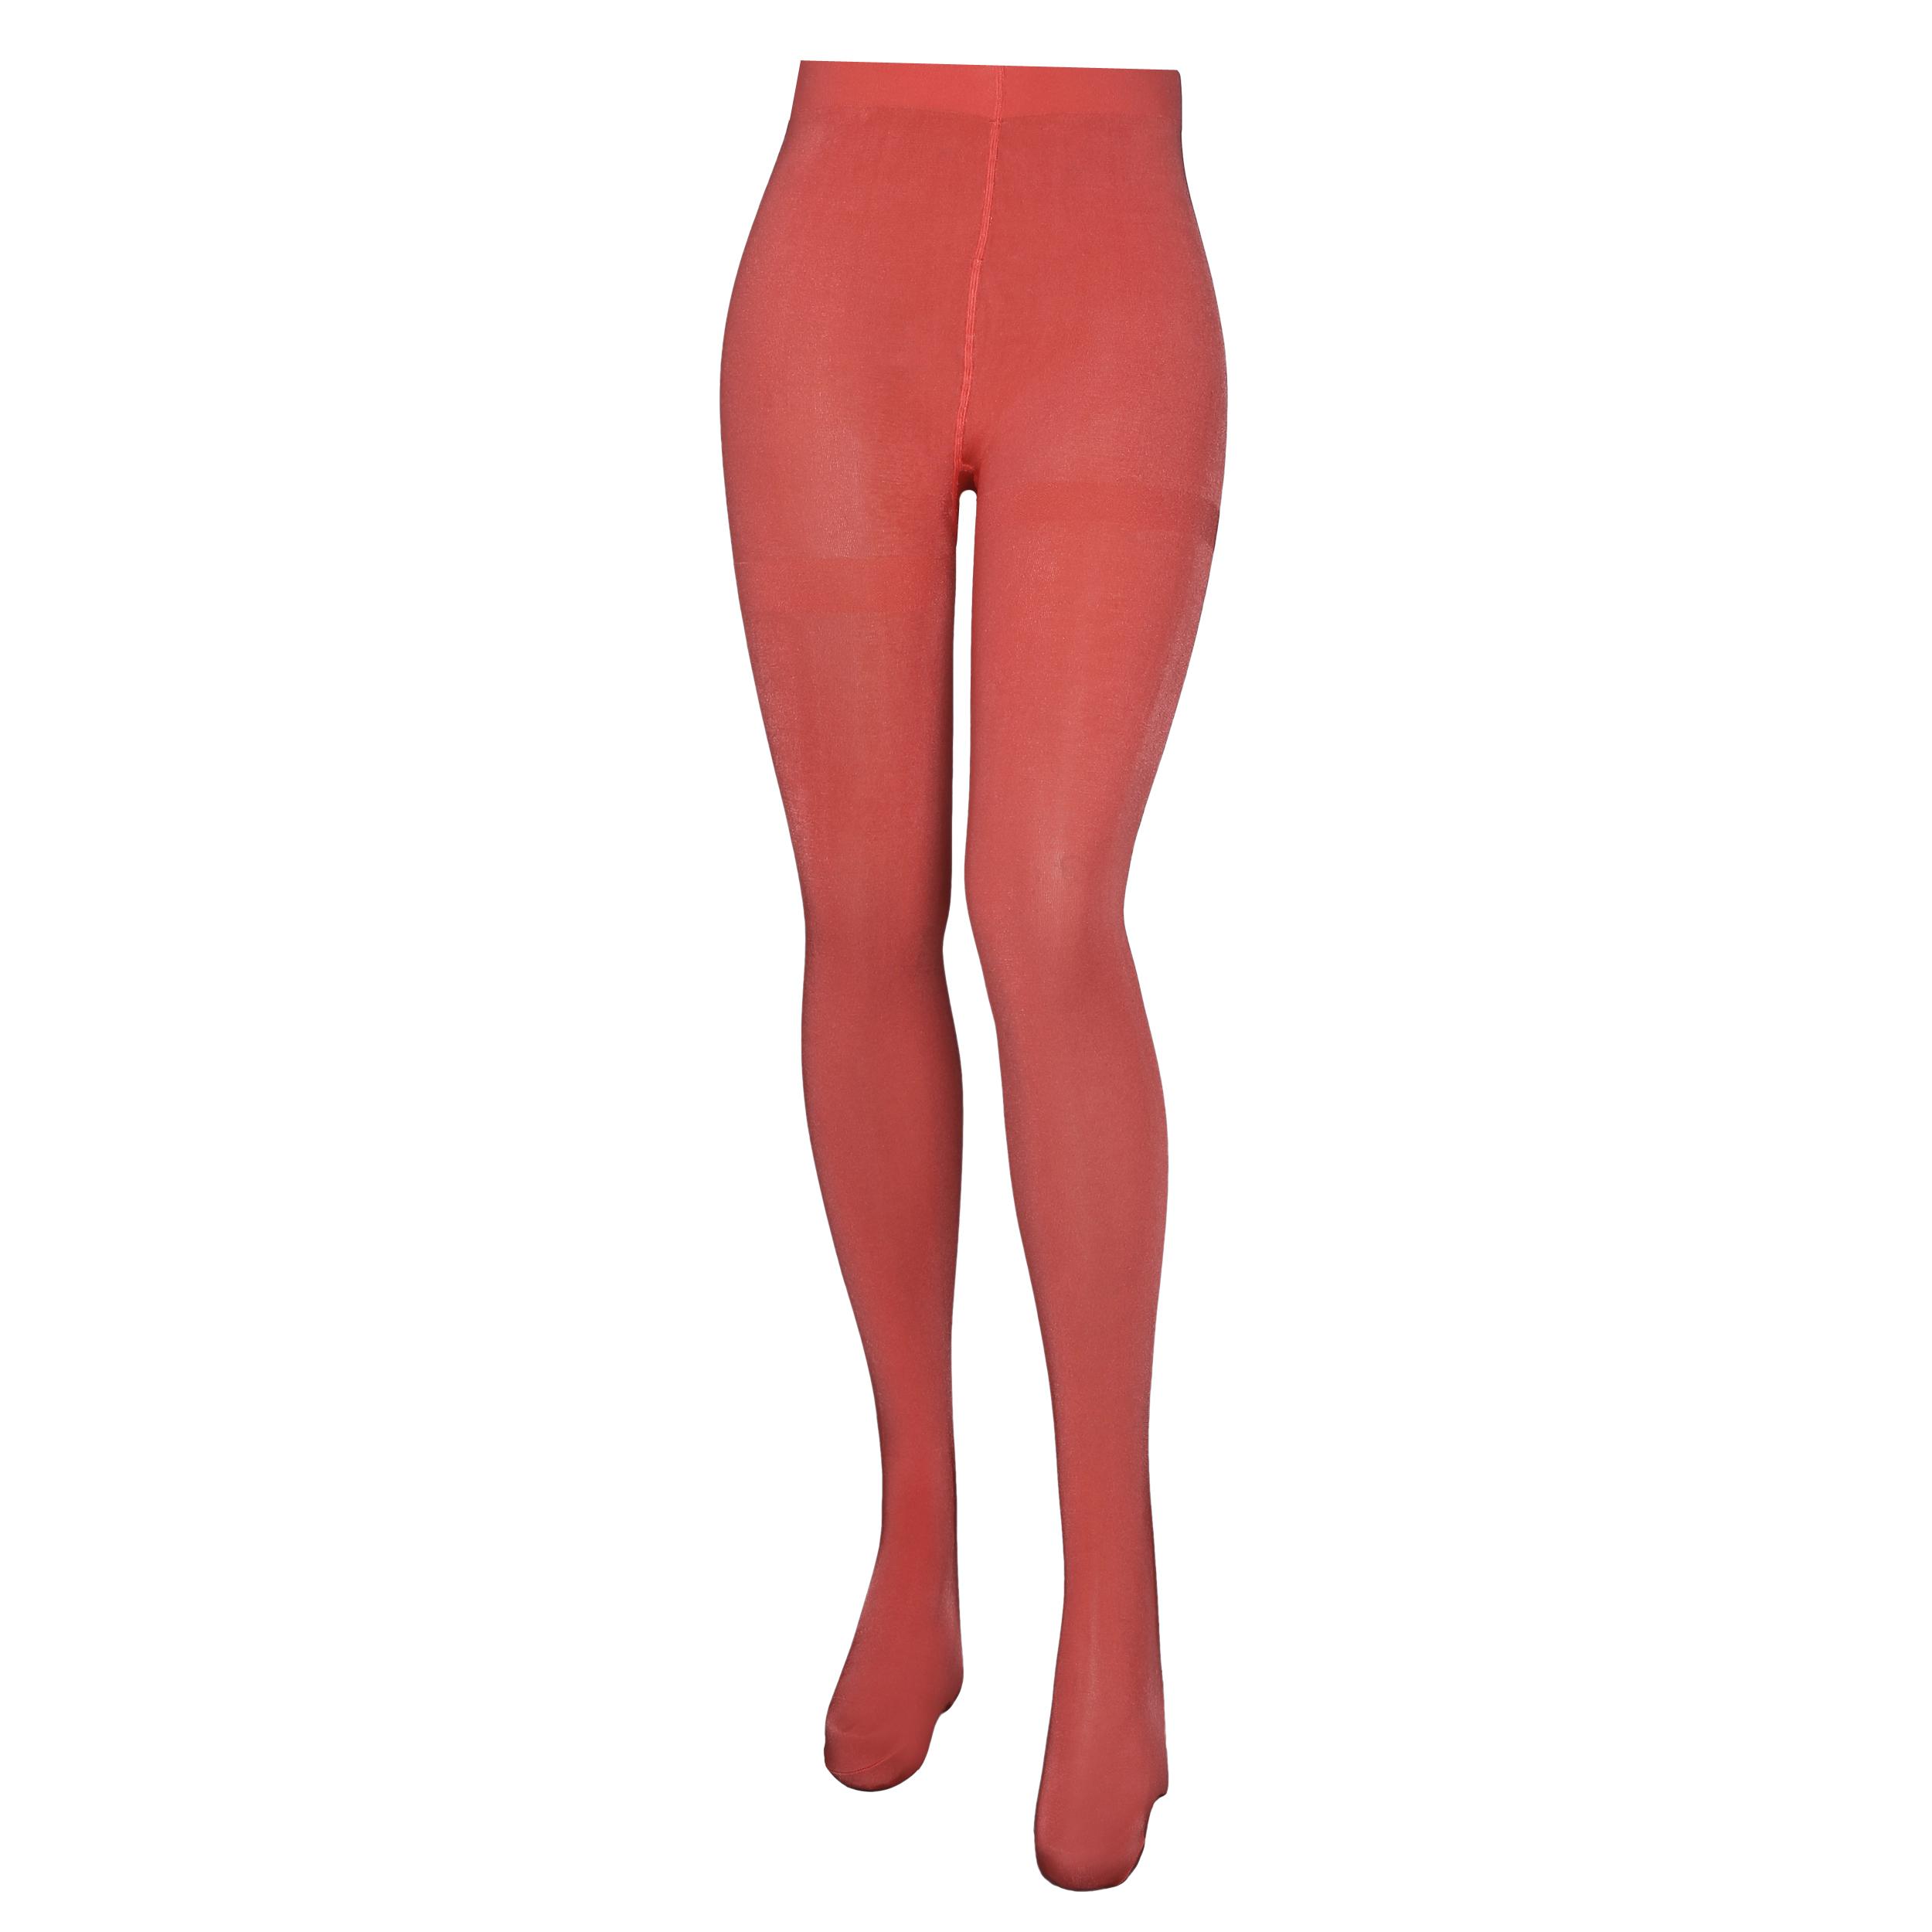 جوراب شلواری زنانه اکسلنس مدل 1128511 رنگ مرجانی